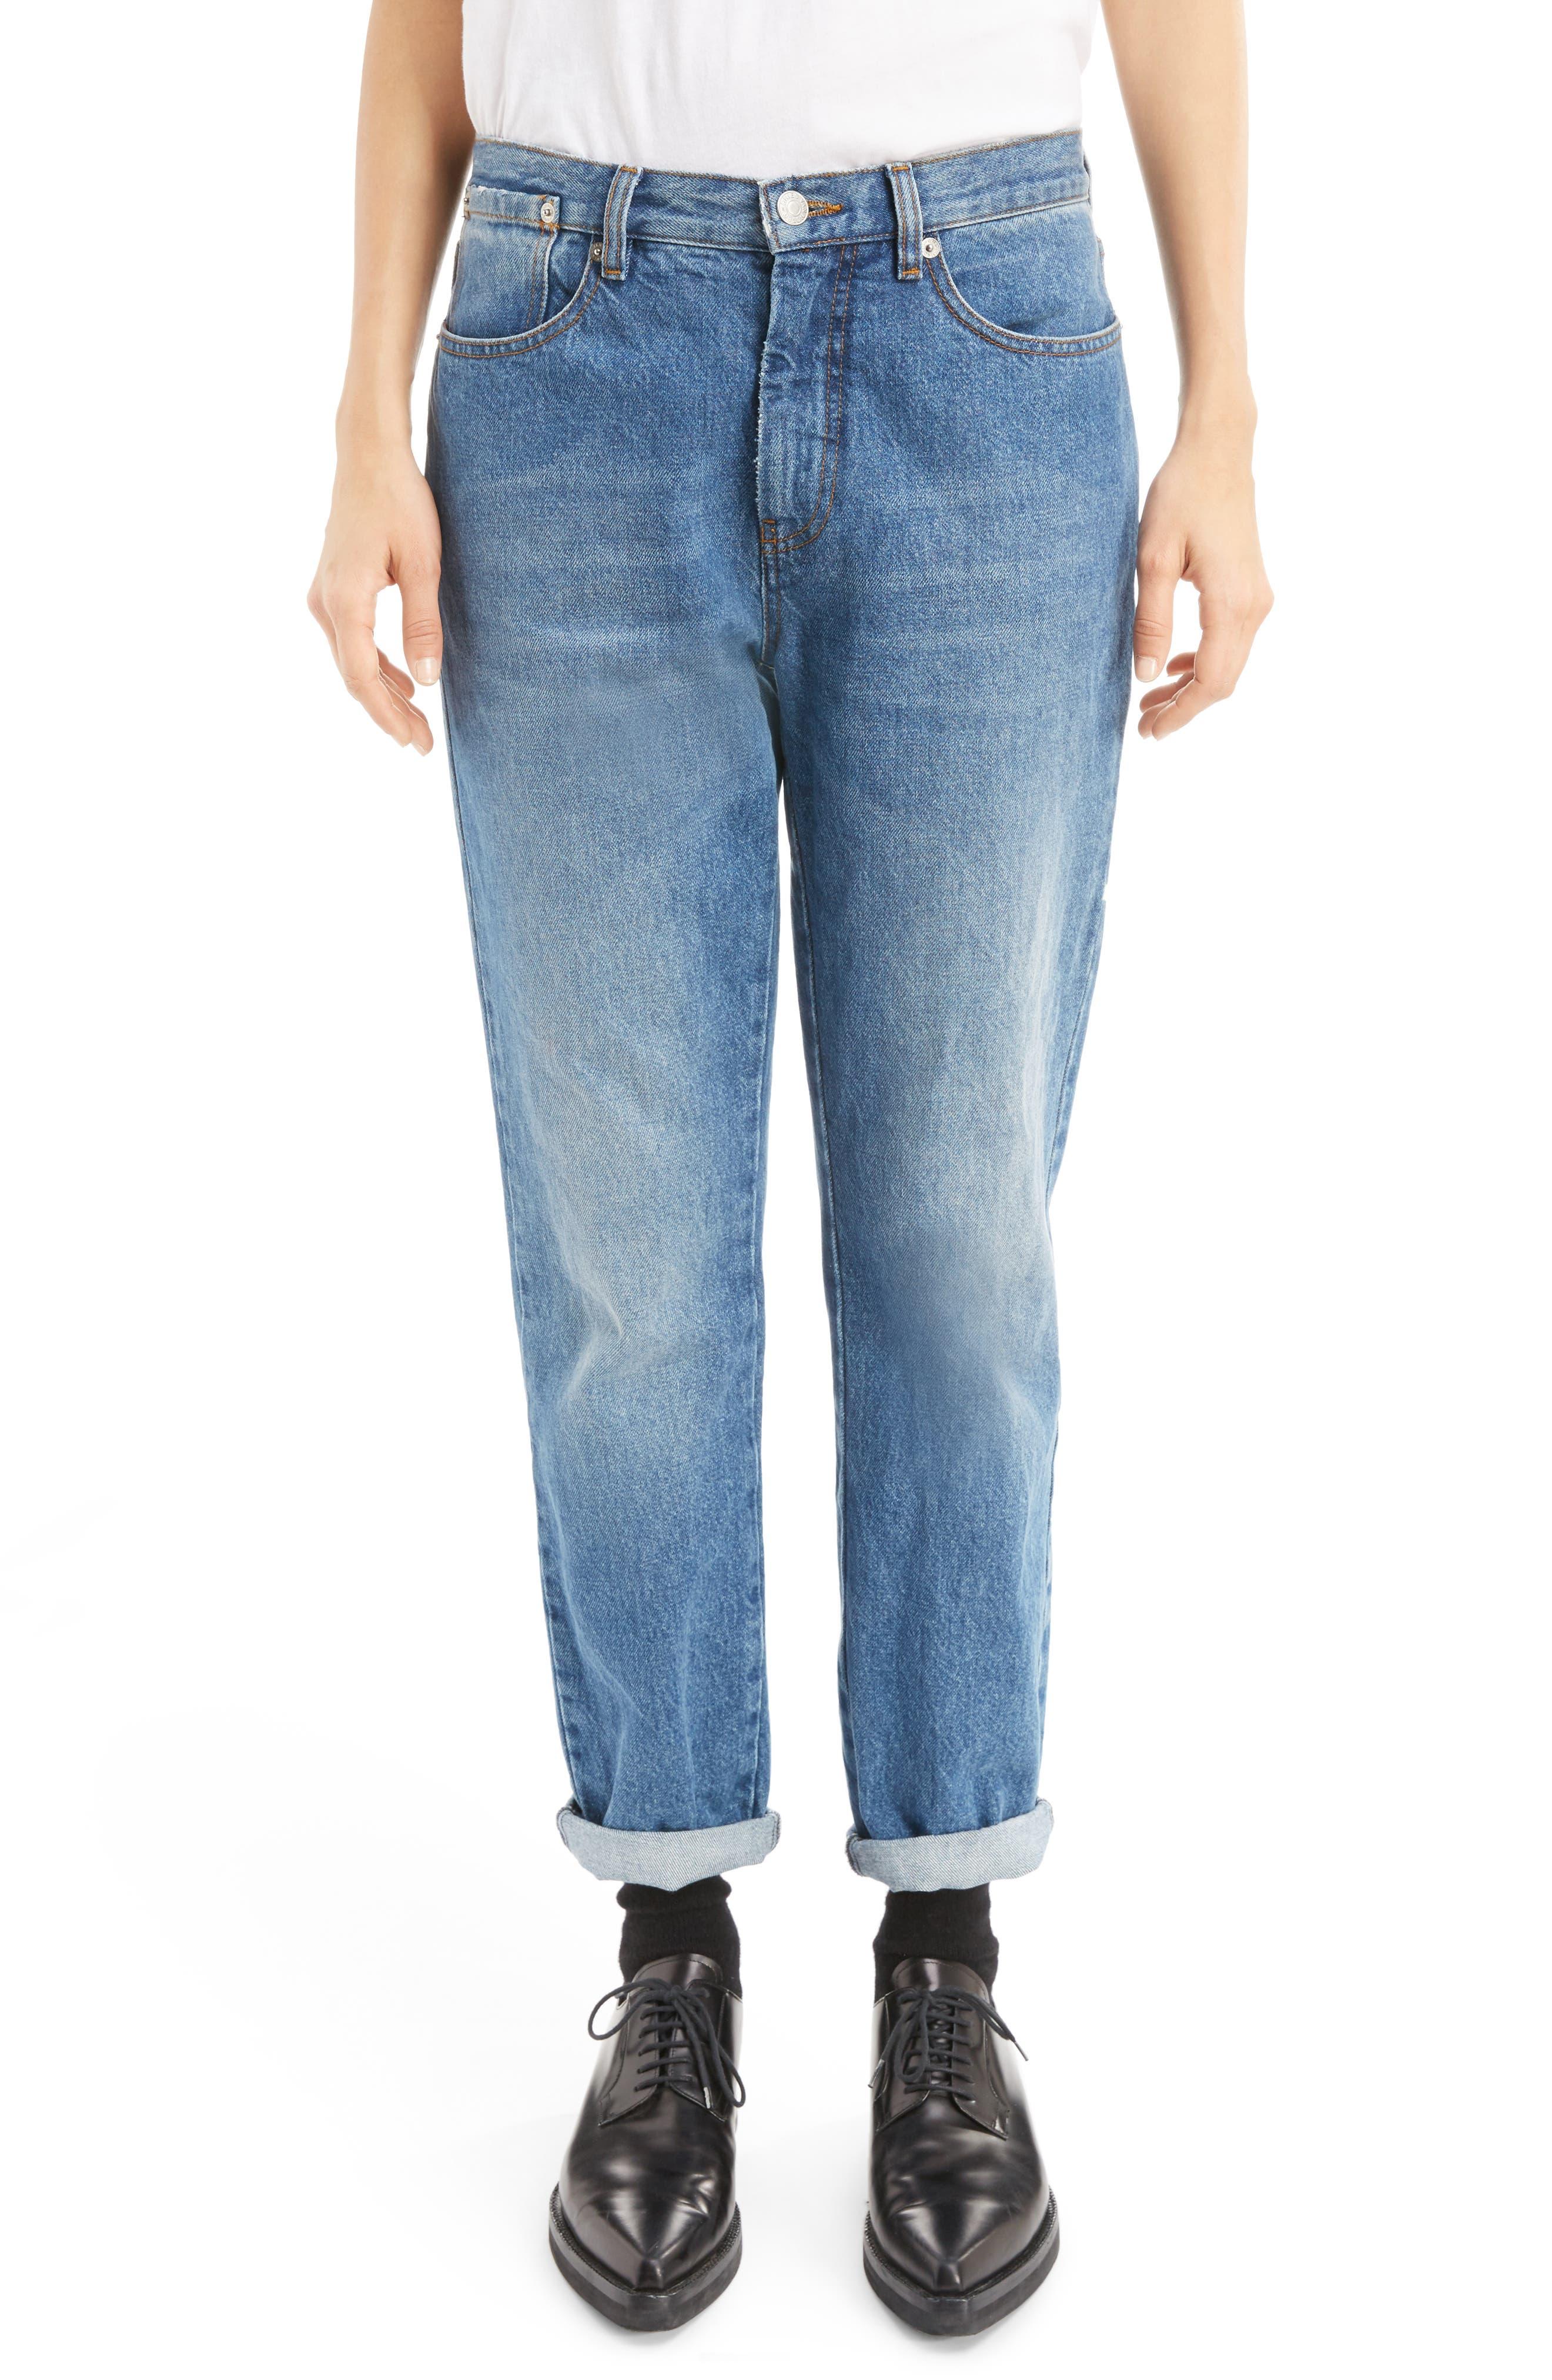 Dries Van Noten Cuffed Straight Leg Jeans